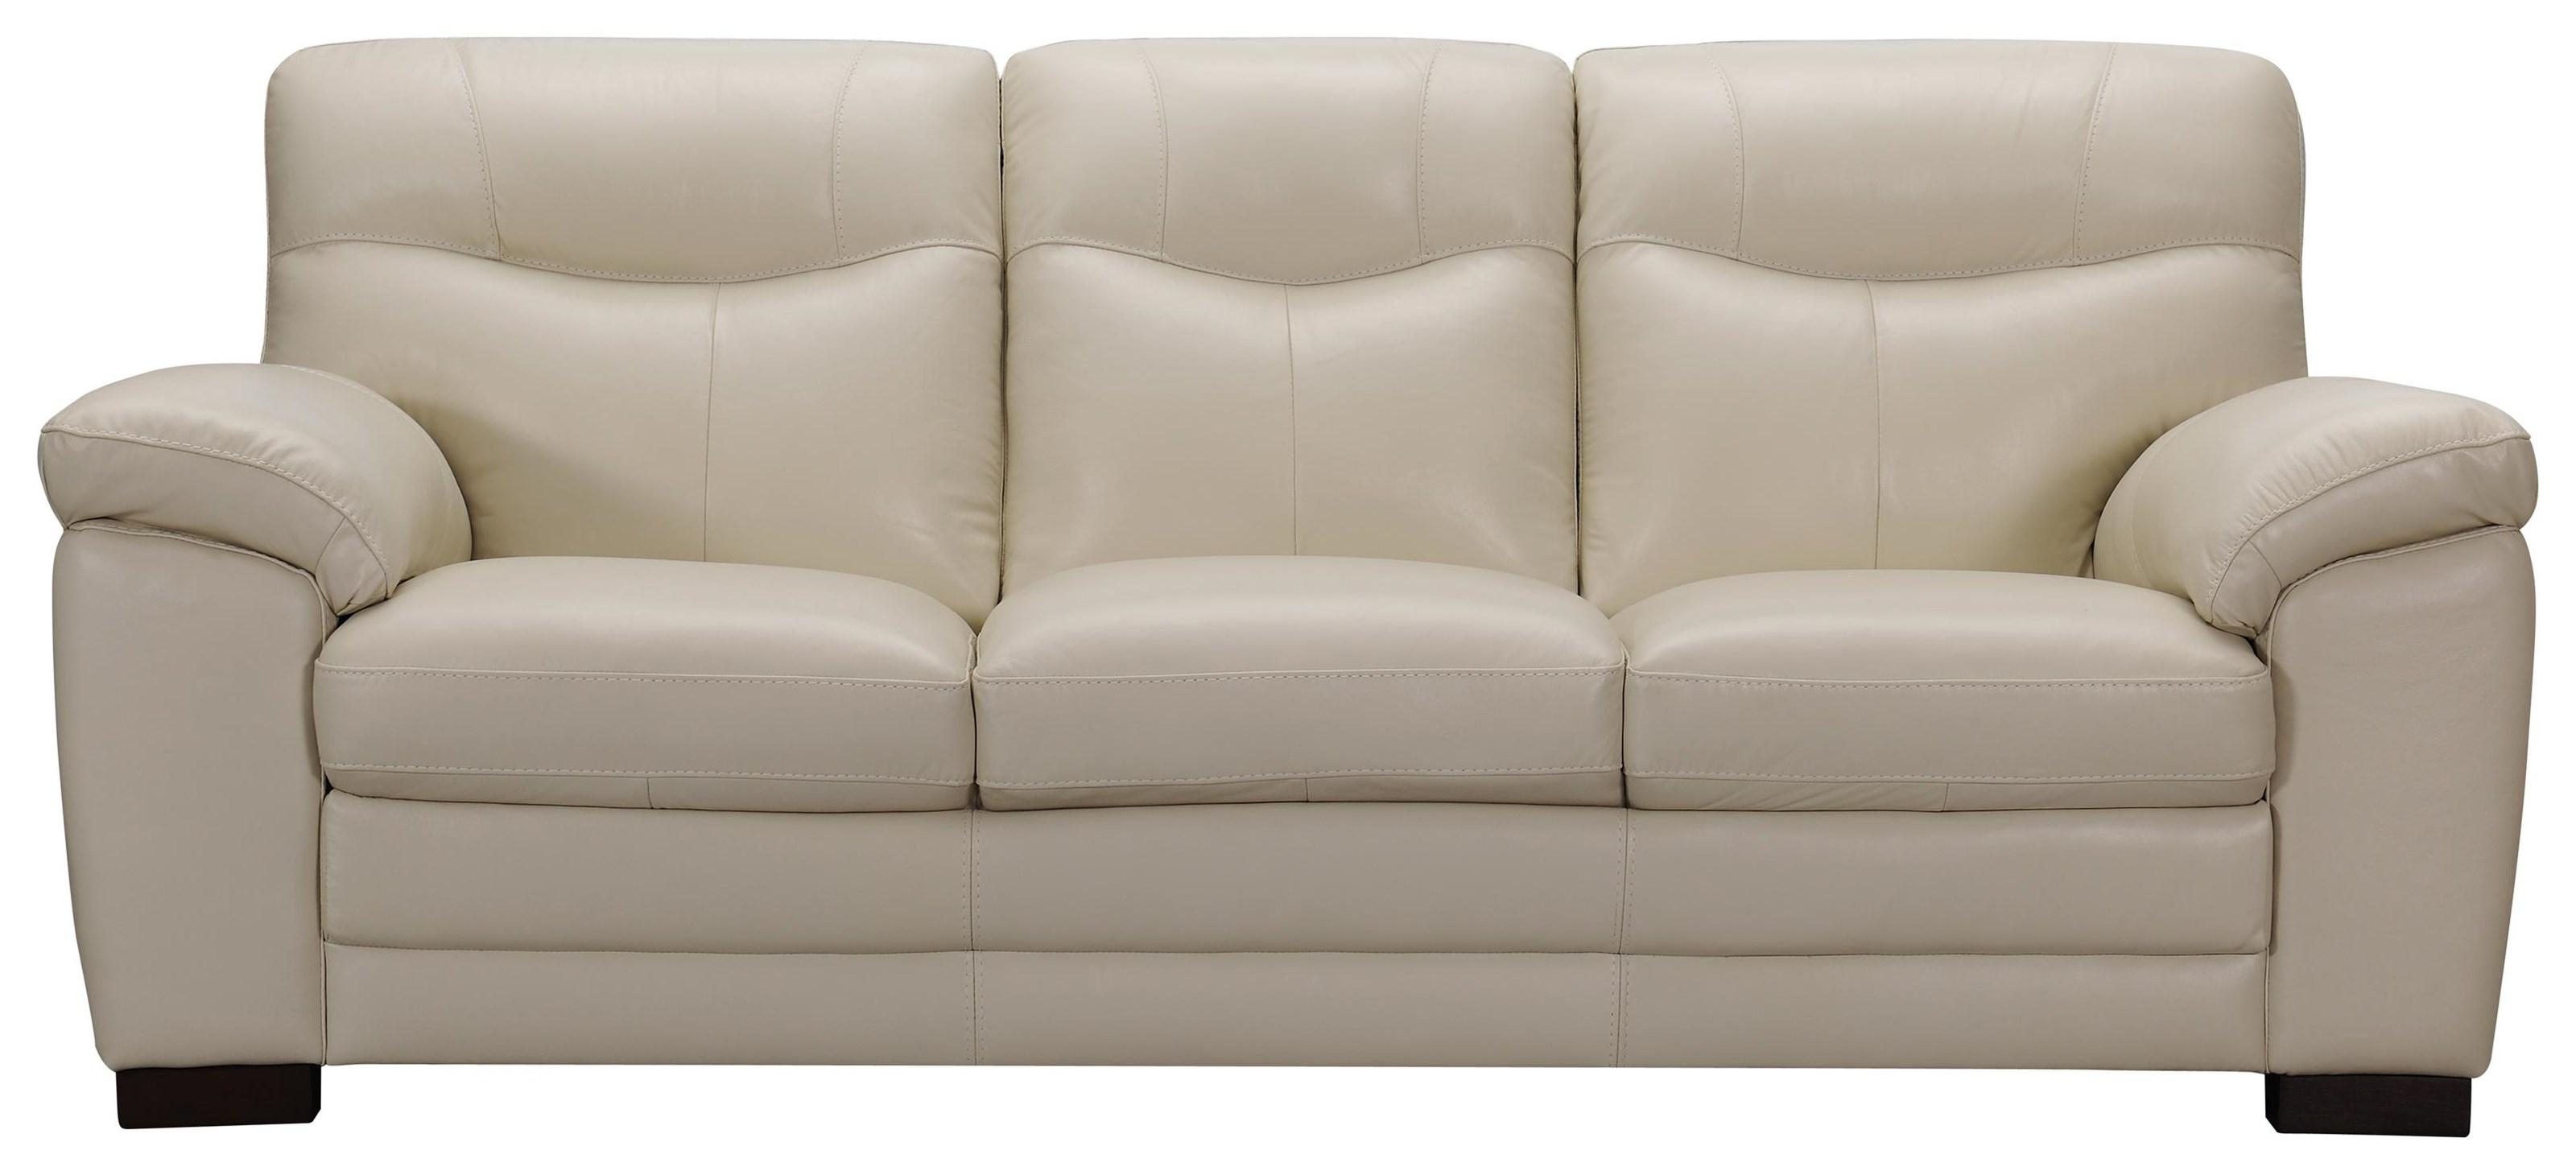 Violino 31852 Ivory Leather Sofa - Item Number: 31852 M3083IVORY